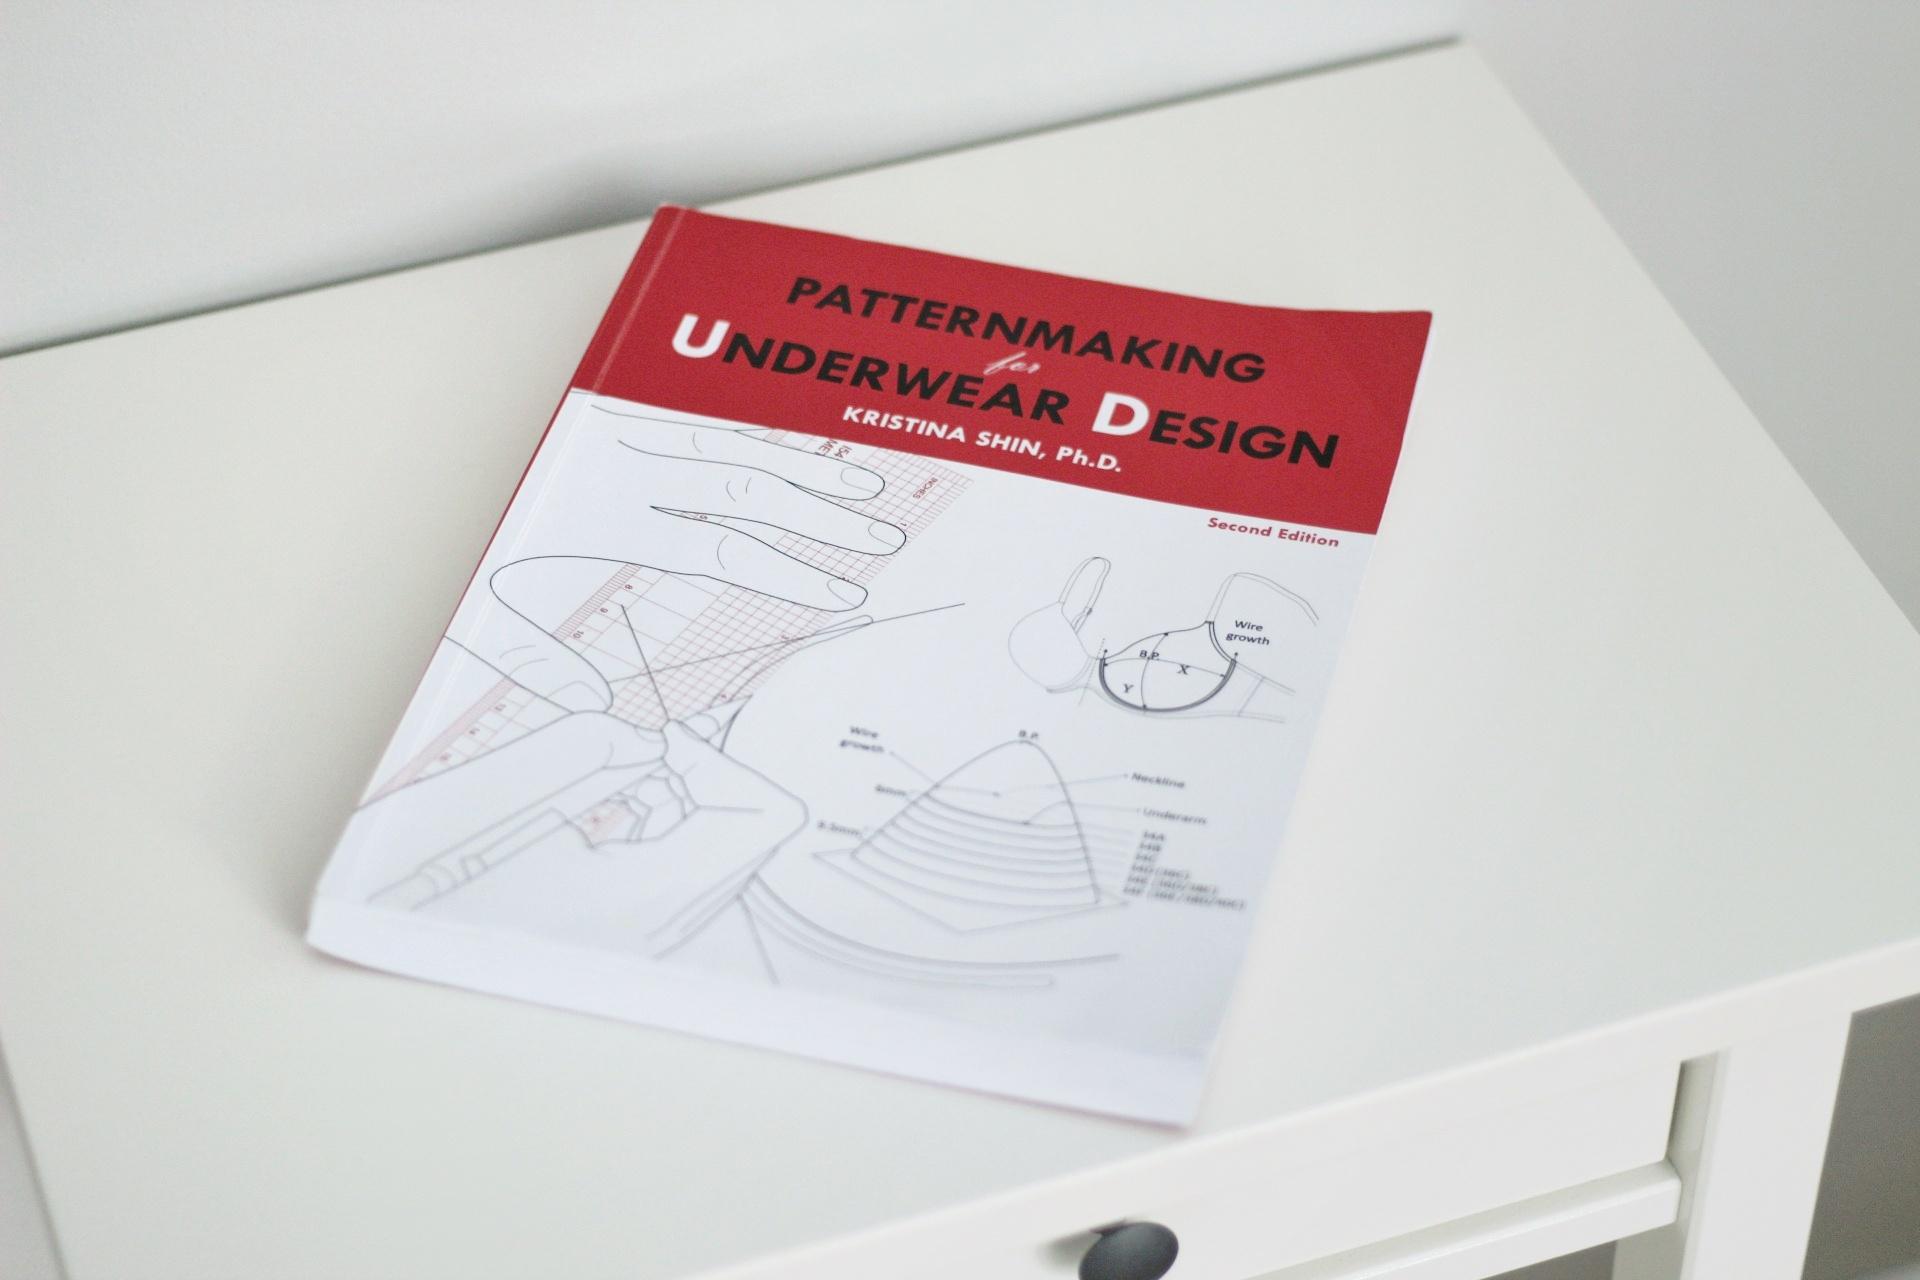 RECENZJA KSIĄŻKI PATTERNMAKING FOR UNDERWEAR DESIGN